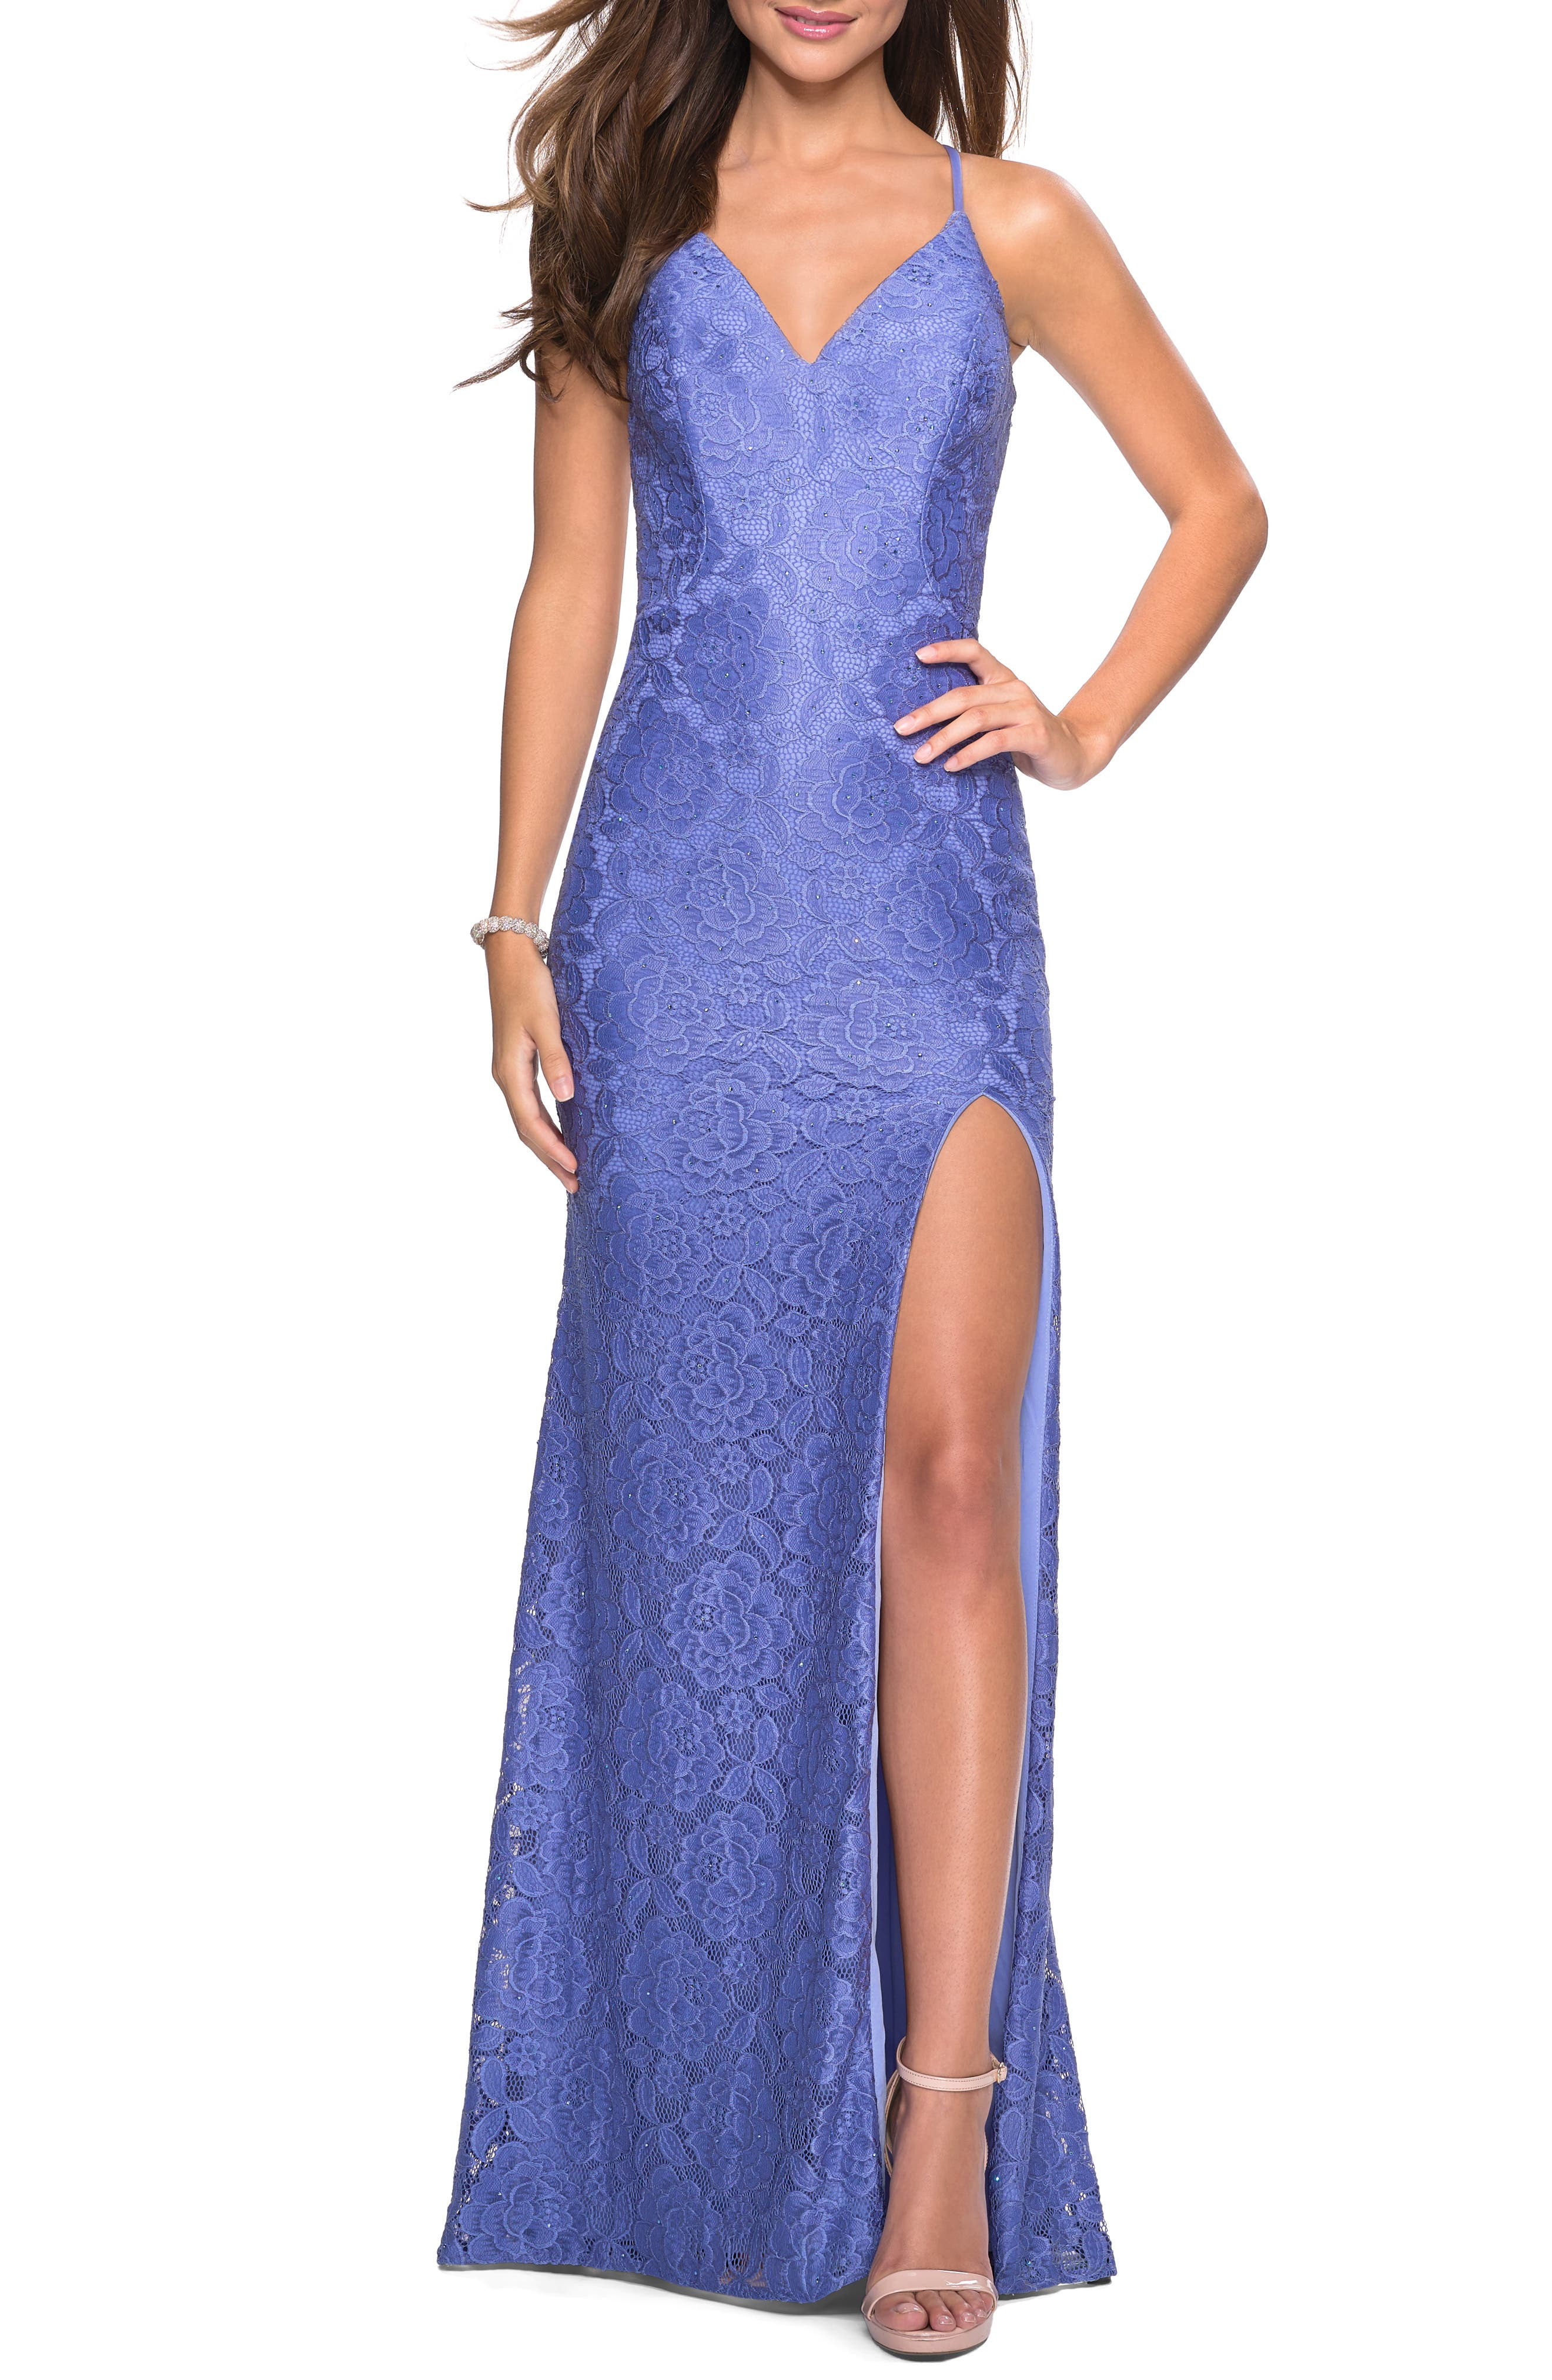 La Femme Strappy Back Lace Evening Dress, Blue